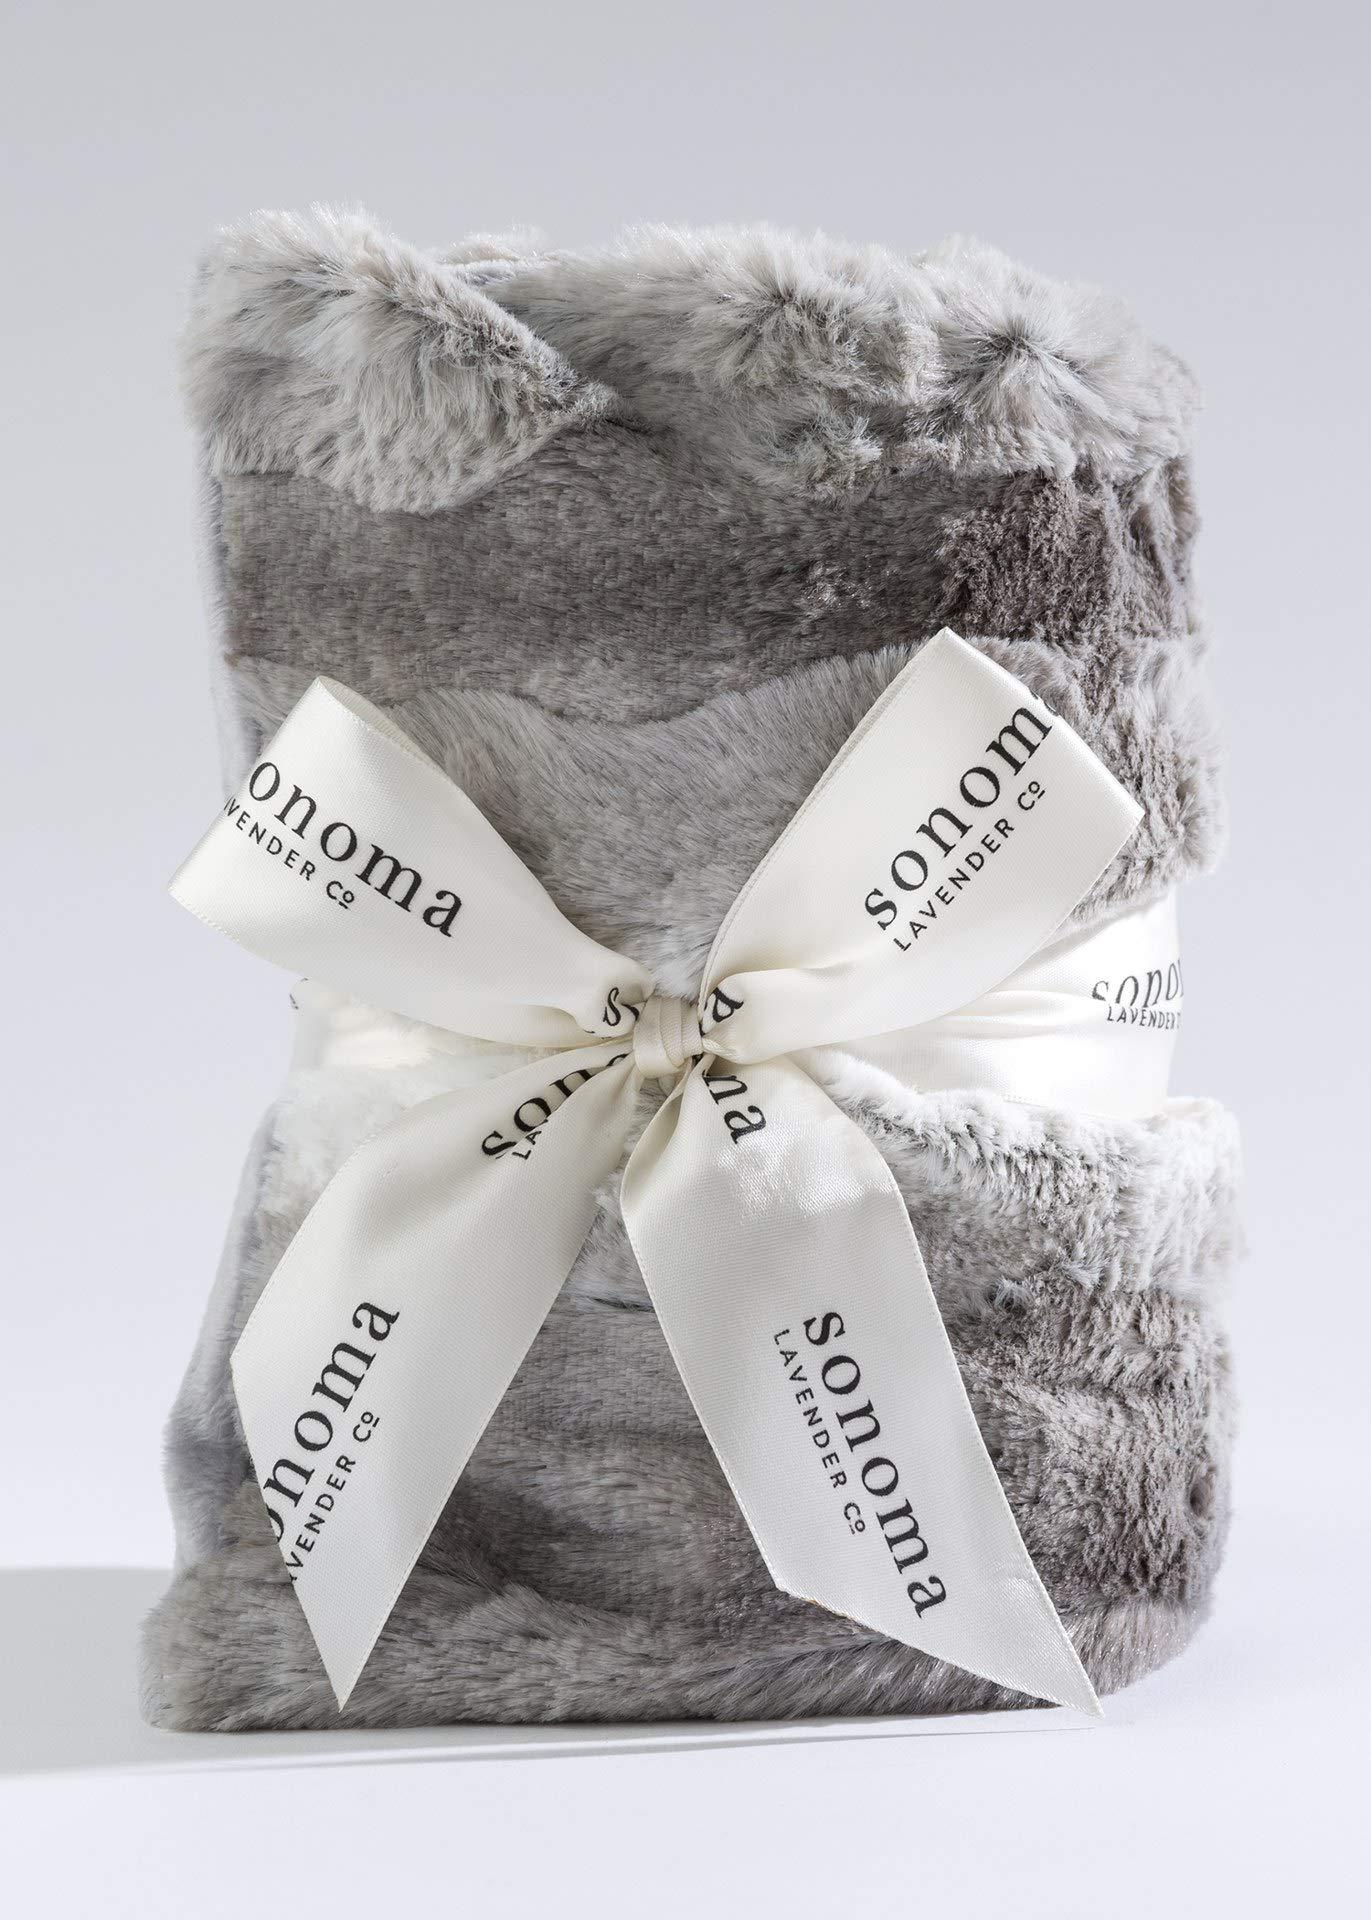 Lavender SPA Heat WRAP in Angora Faux Fur by Sonoma Lavender